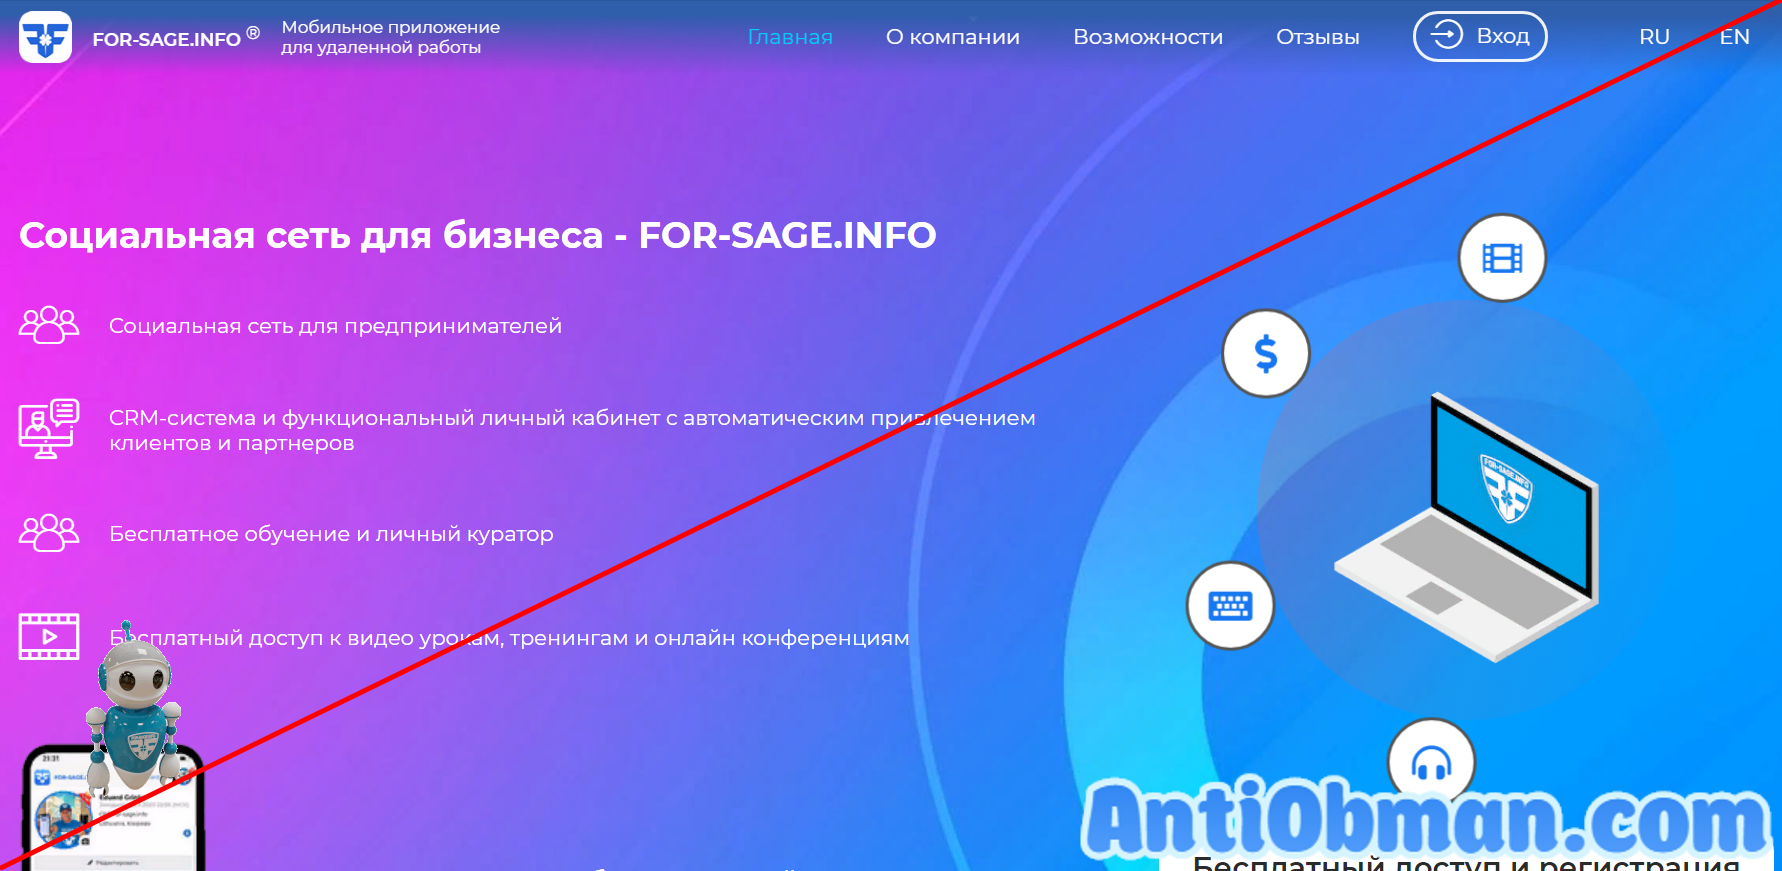 For-sage.info - отзывы и обзор